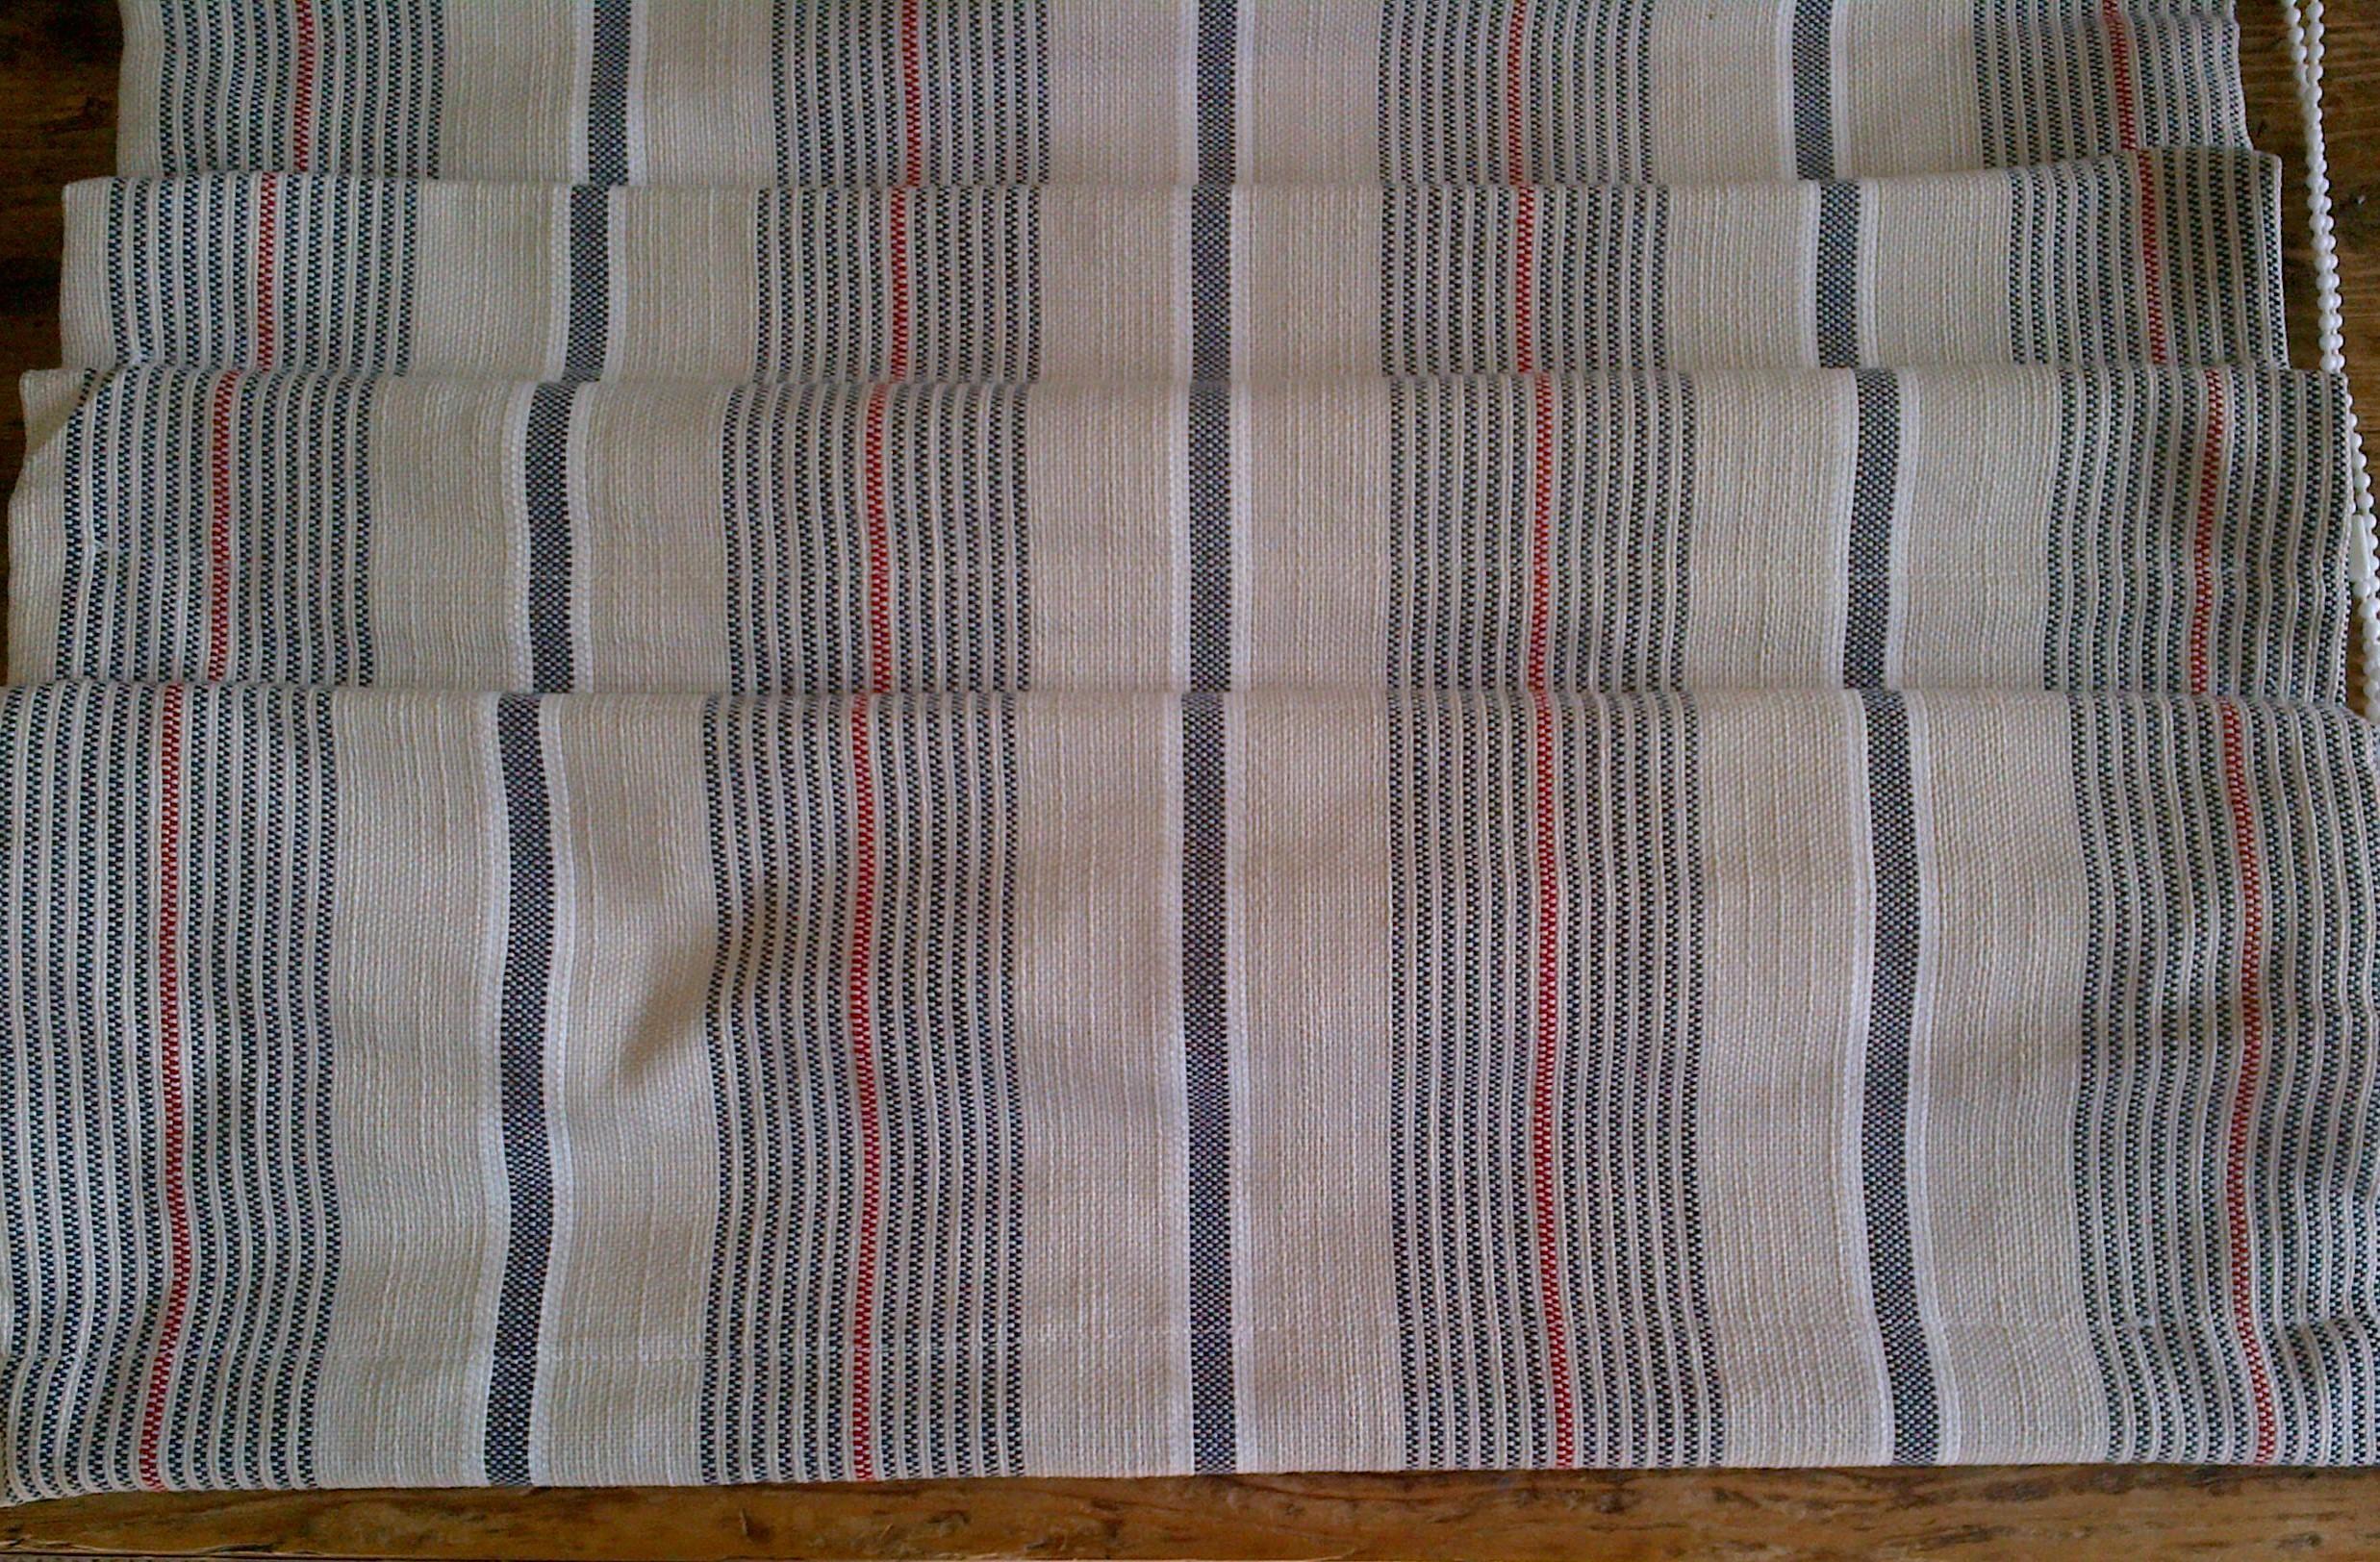 NEXT Nautical Striped Roman Blind - 120 x 120cm NEW